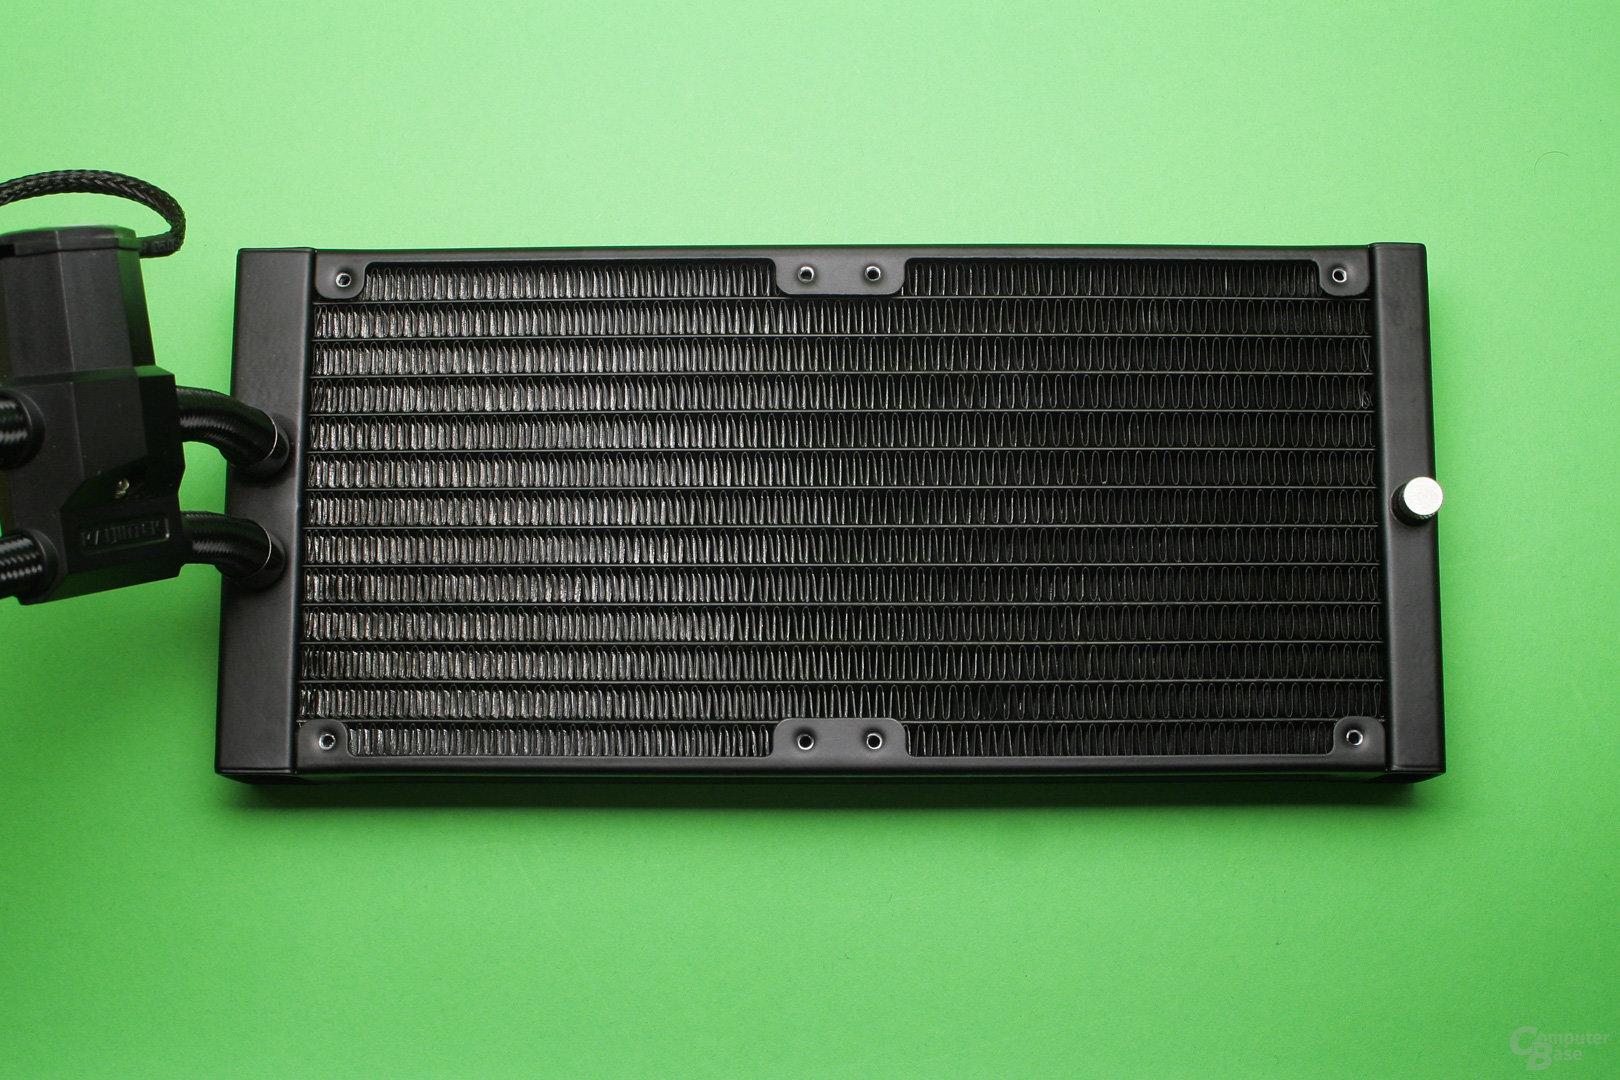 Raijintek Orcus 240: Gut verarbeiteter Aluminium-Radiator